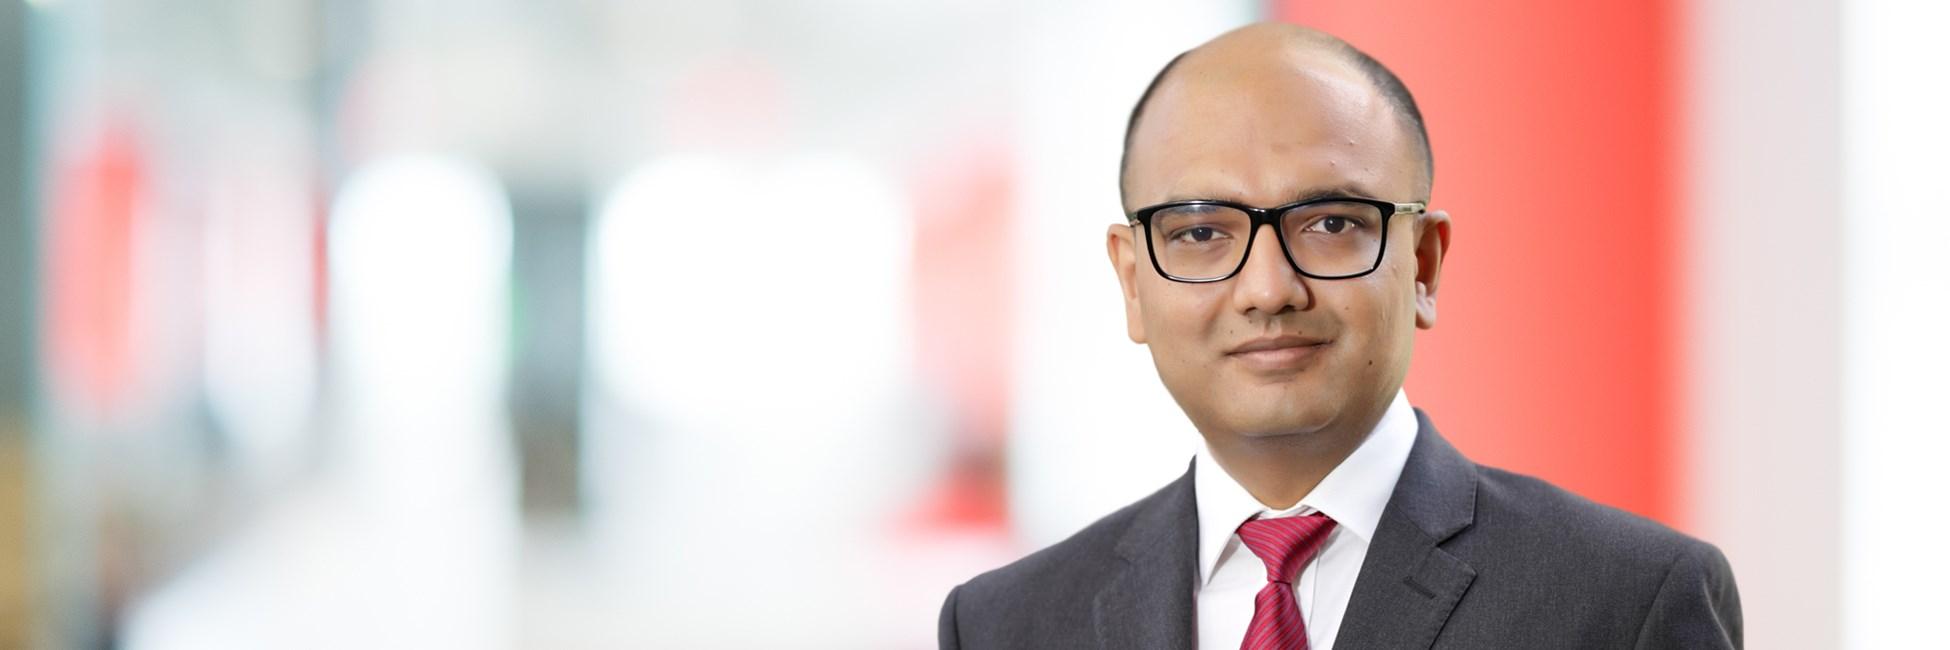 Parijat Jain - Management Consultant - Bain & Company